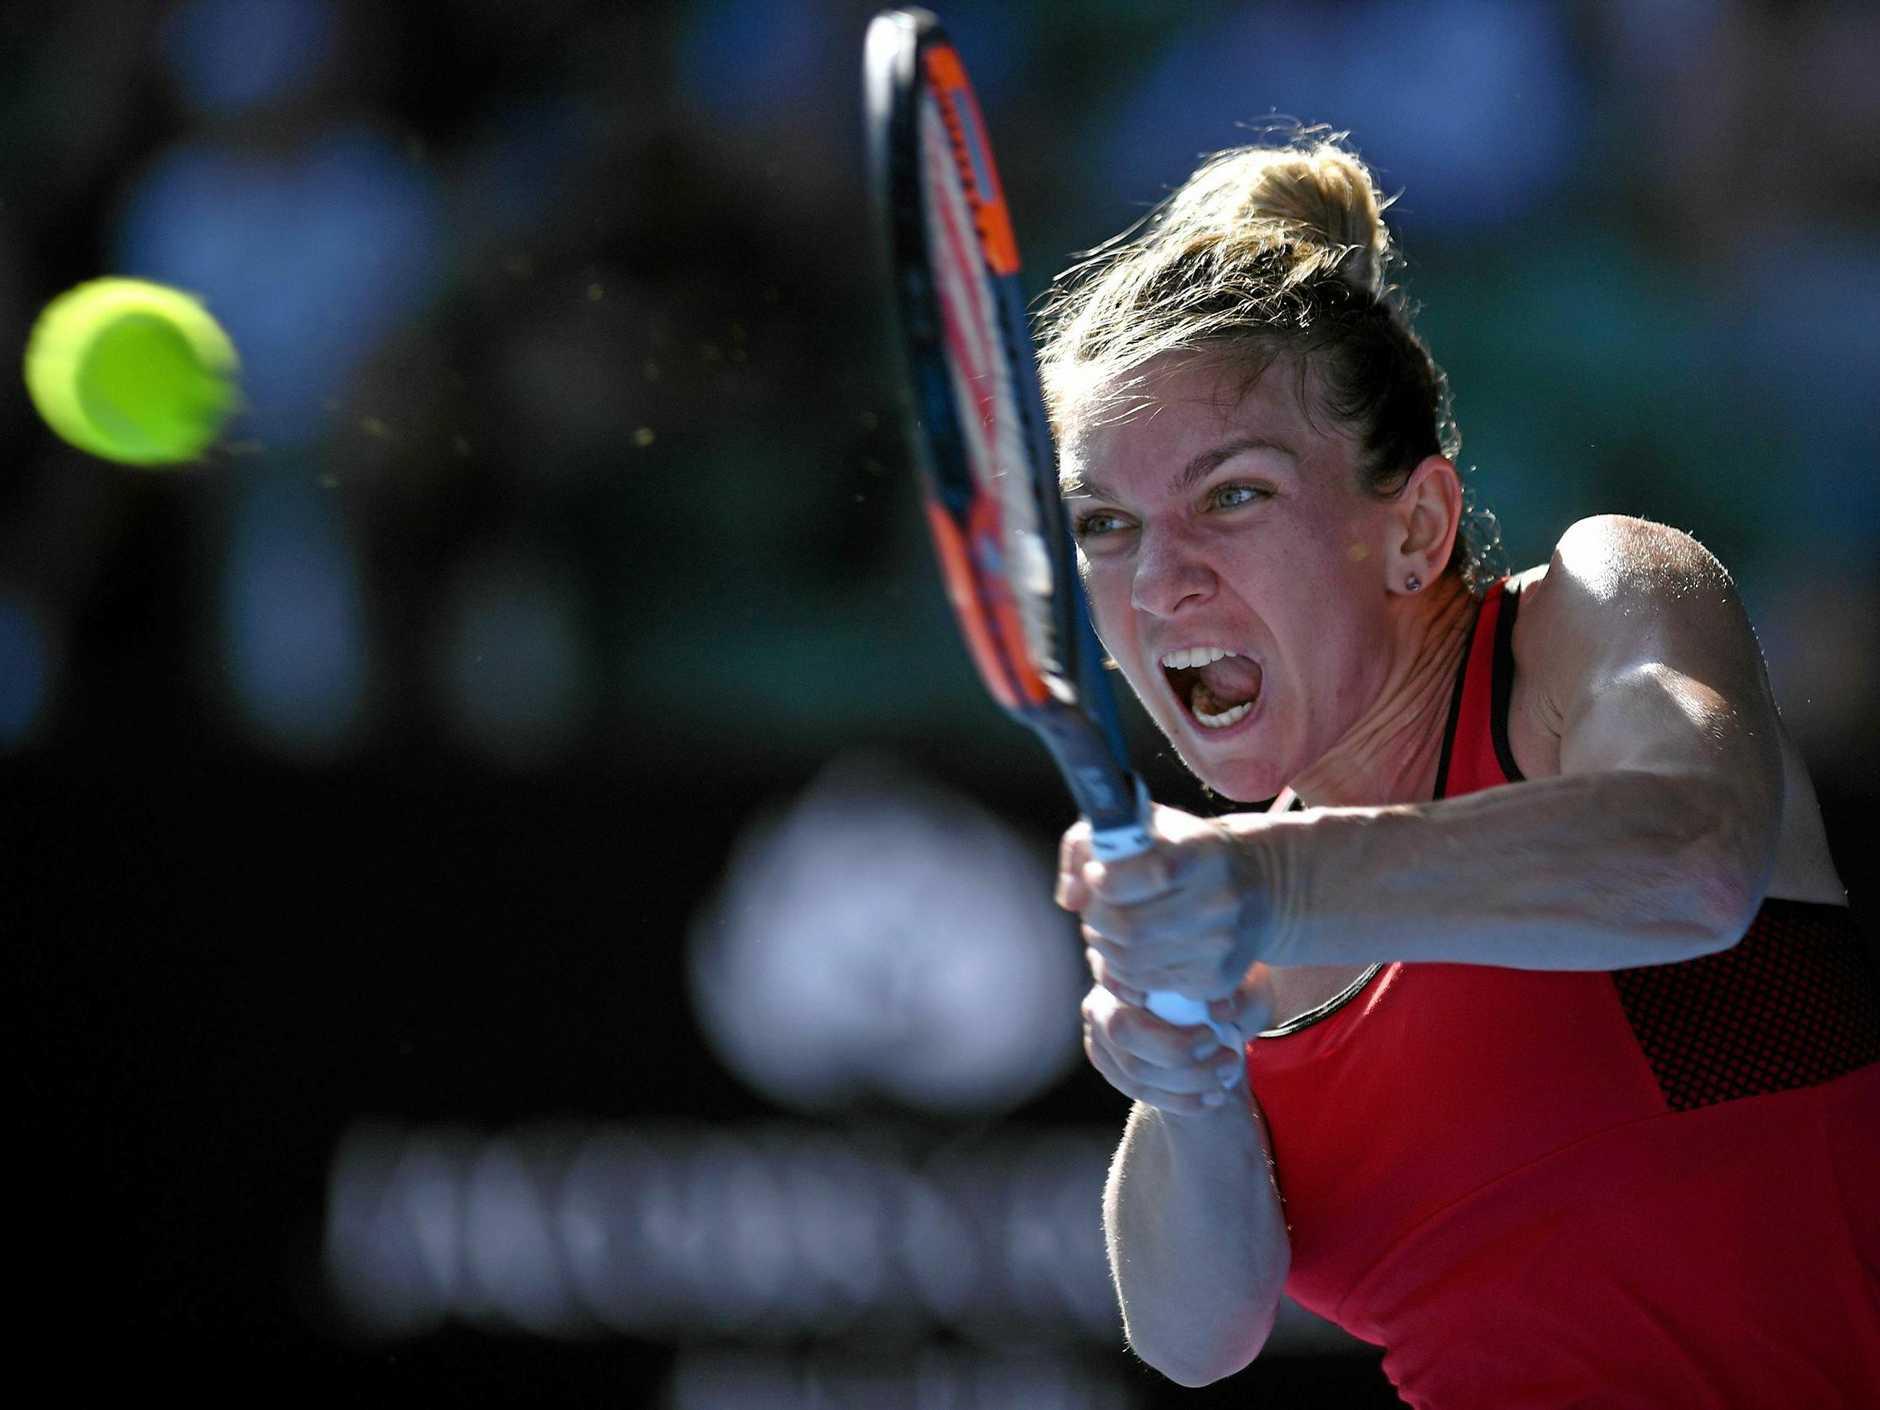 Simona Halep was unable to halt Kiki Bertens' comeback. (AAP Image/Lukas Coch)